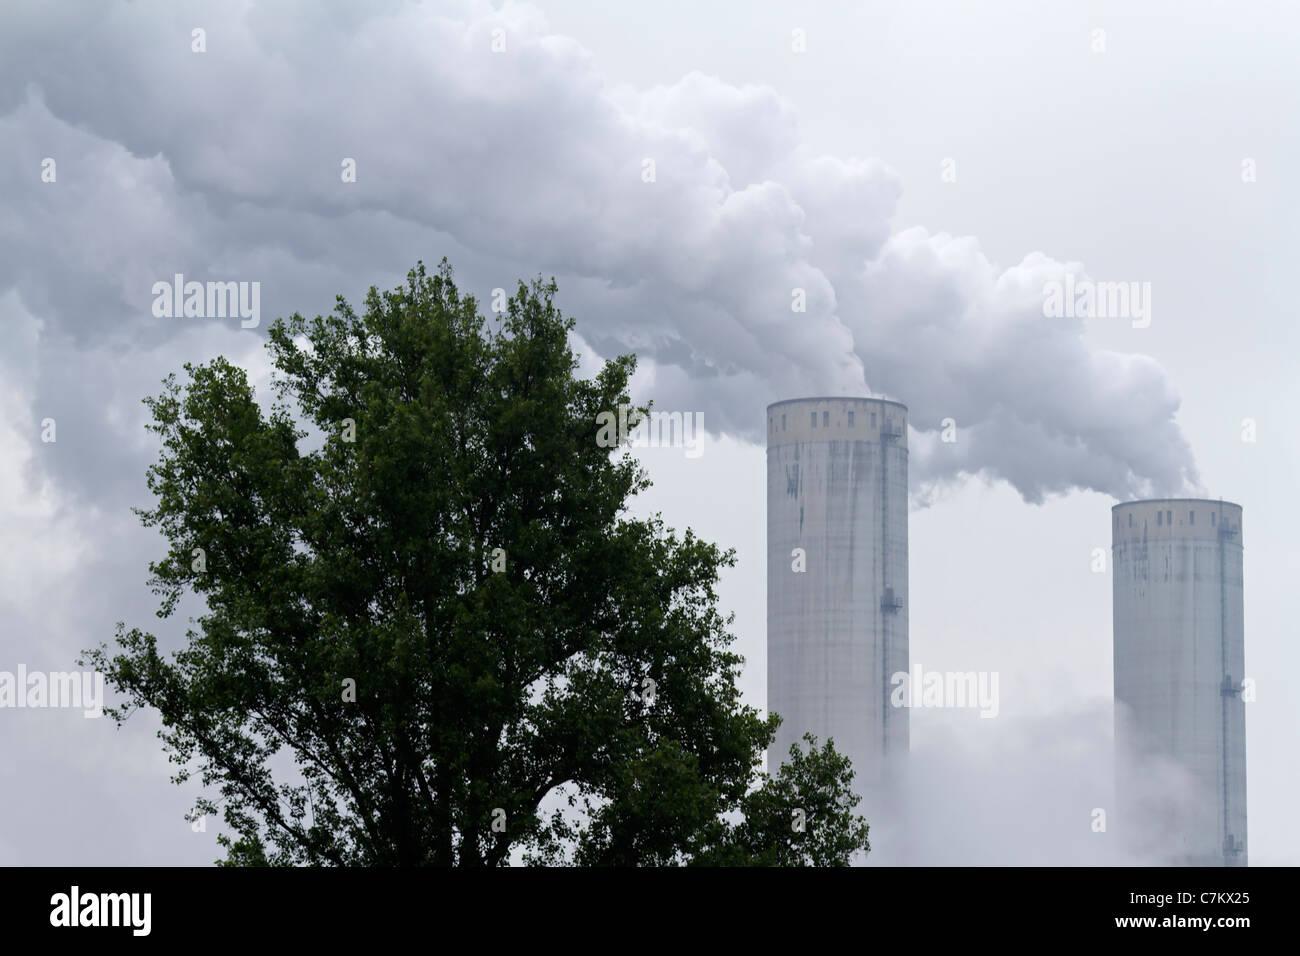 Smoking chimneys - Stock Image